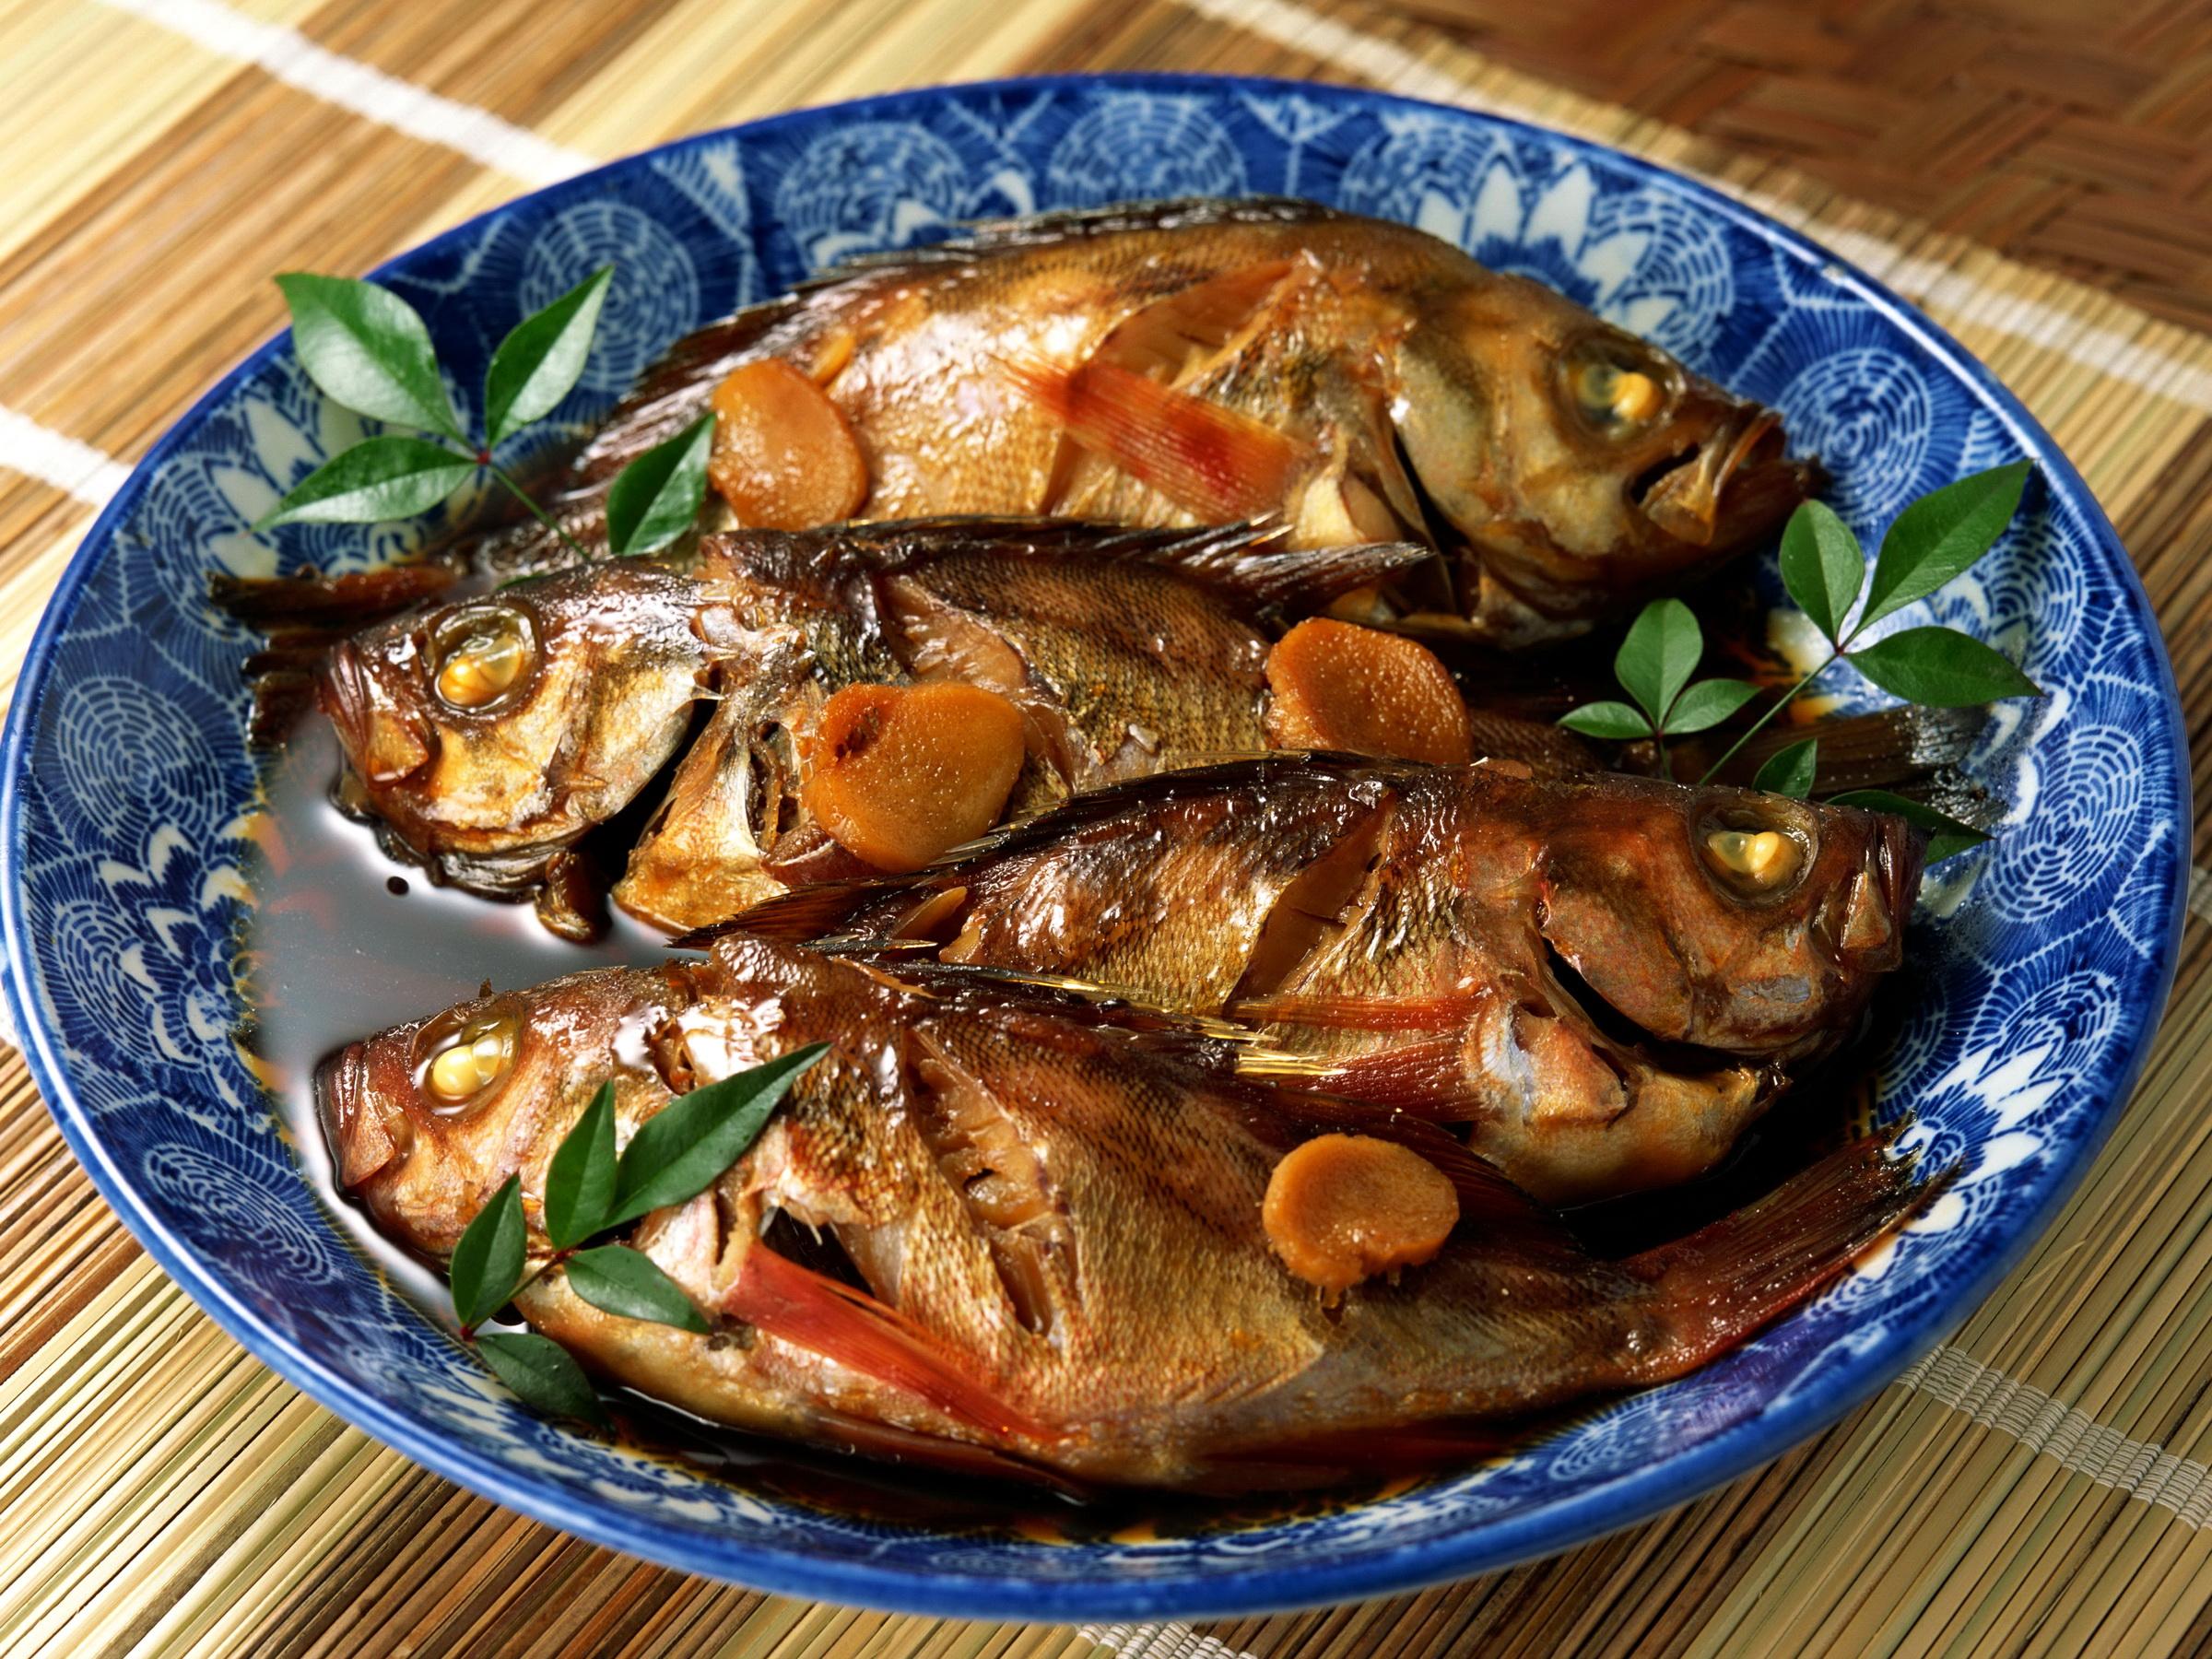 Wallpaper Fish - Food Food Seafoods 2400x1800